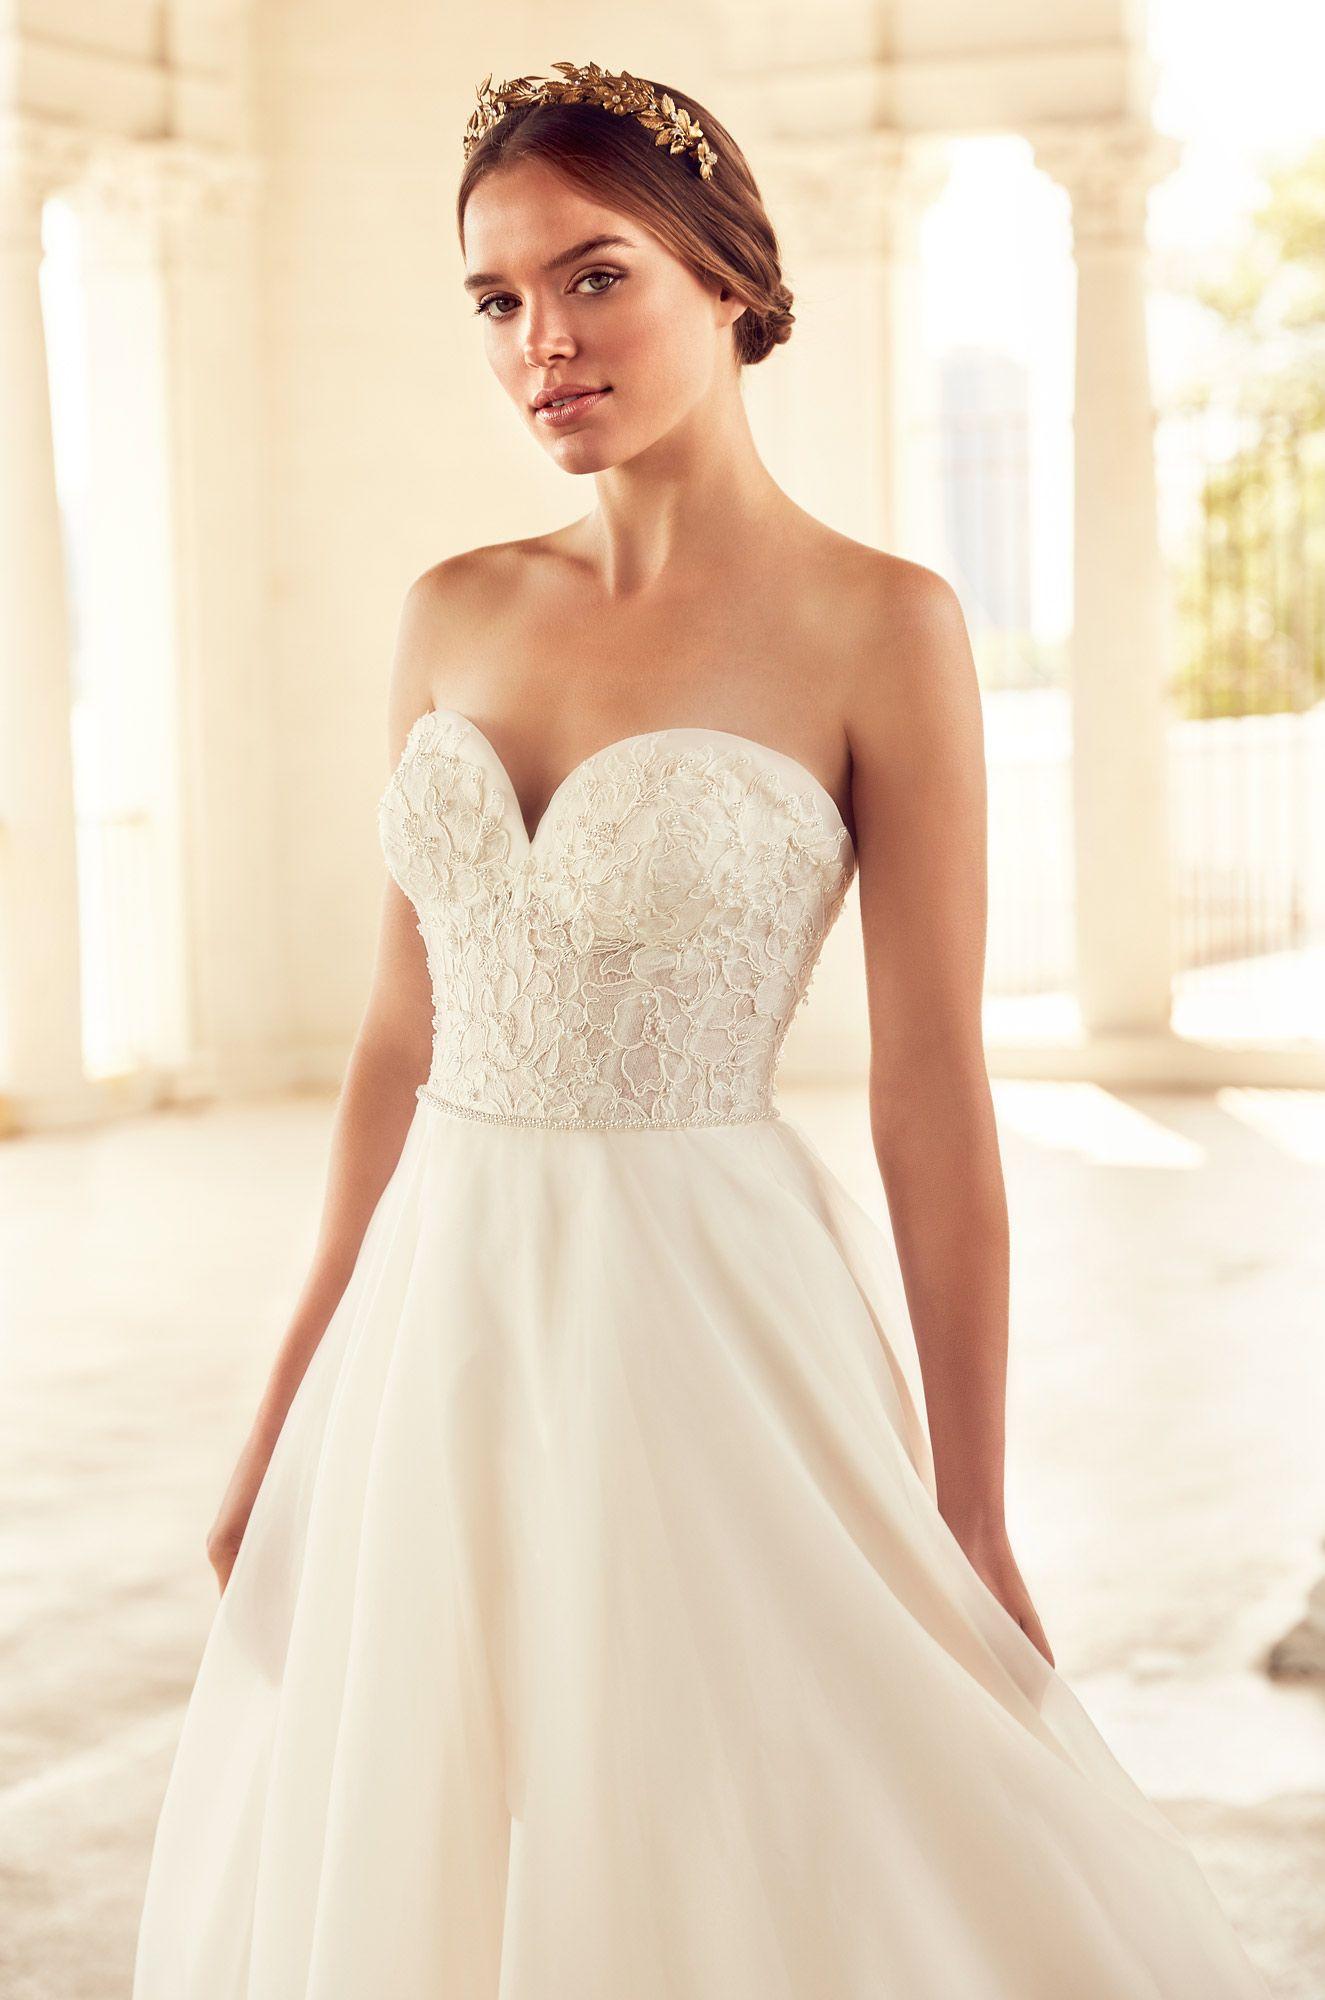 Regal Ball Gown Wedding Dress Style 4785 In 2020 Wedding